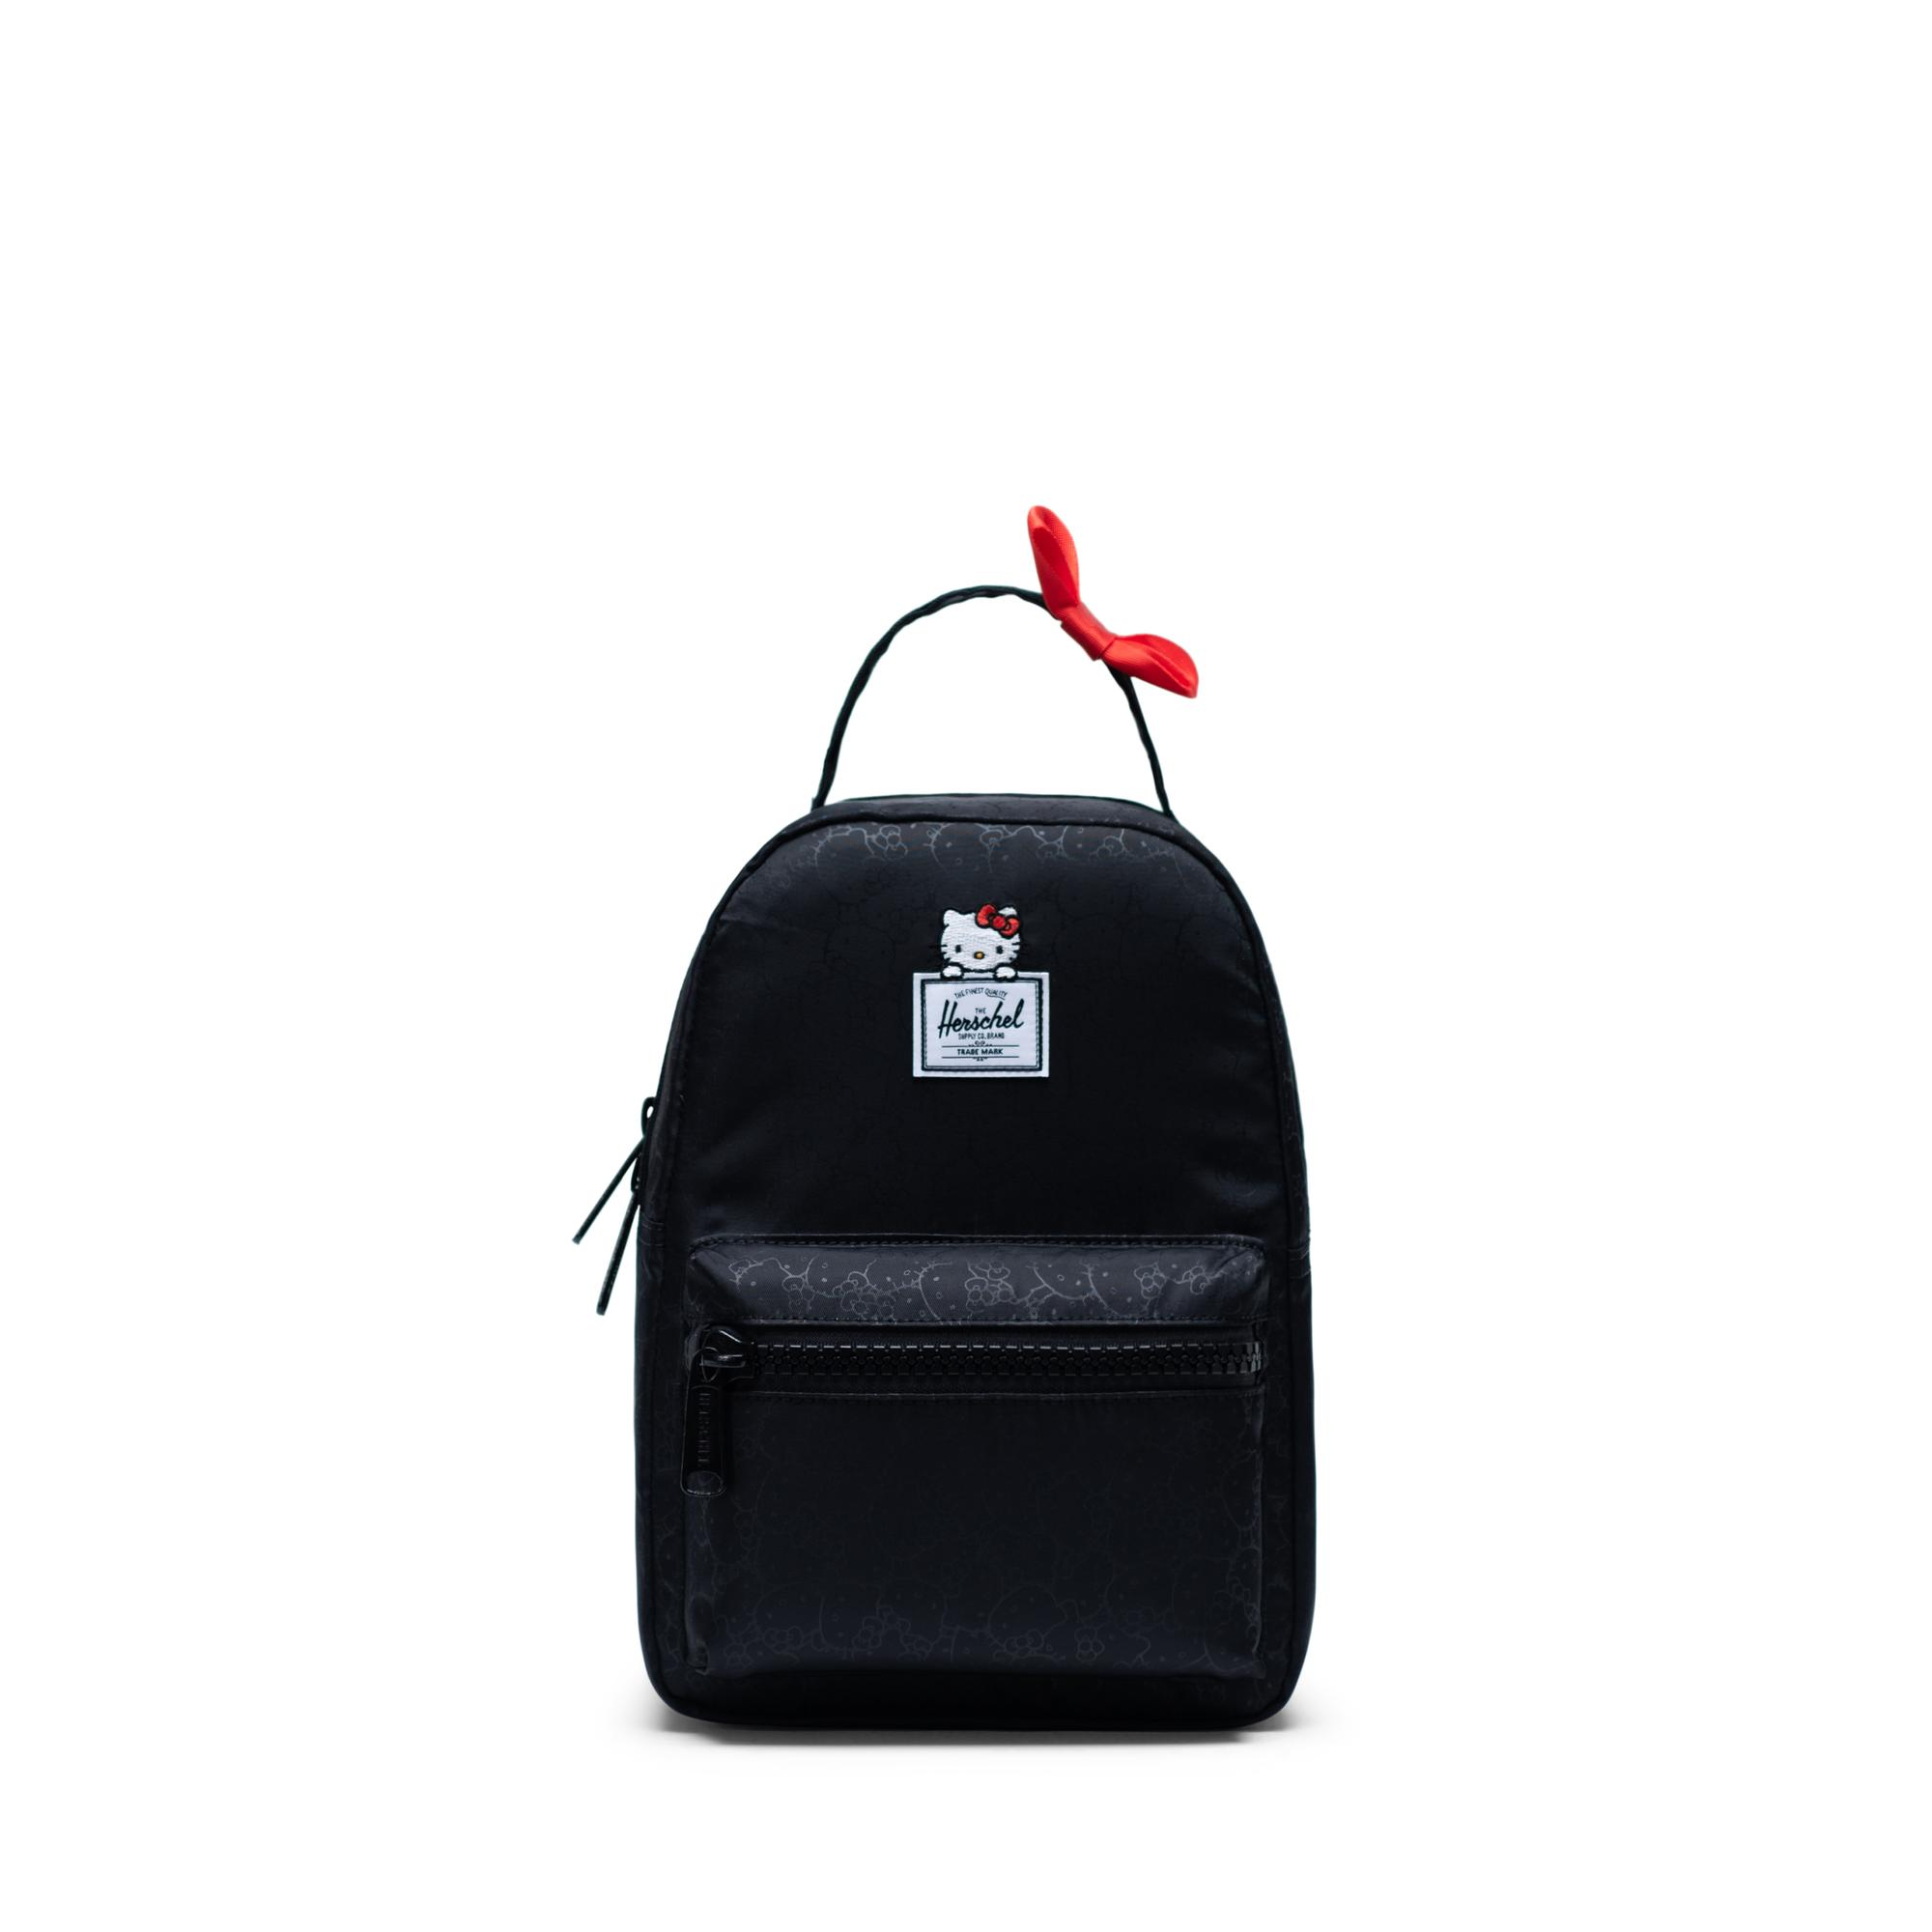 Nova Backpack Mini Hello Kitty   Herschel Supply Company 95229ff3c1